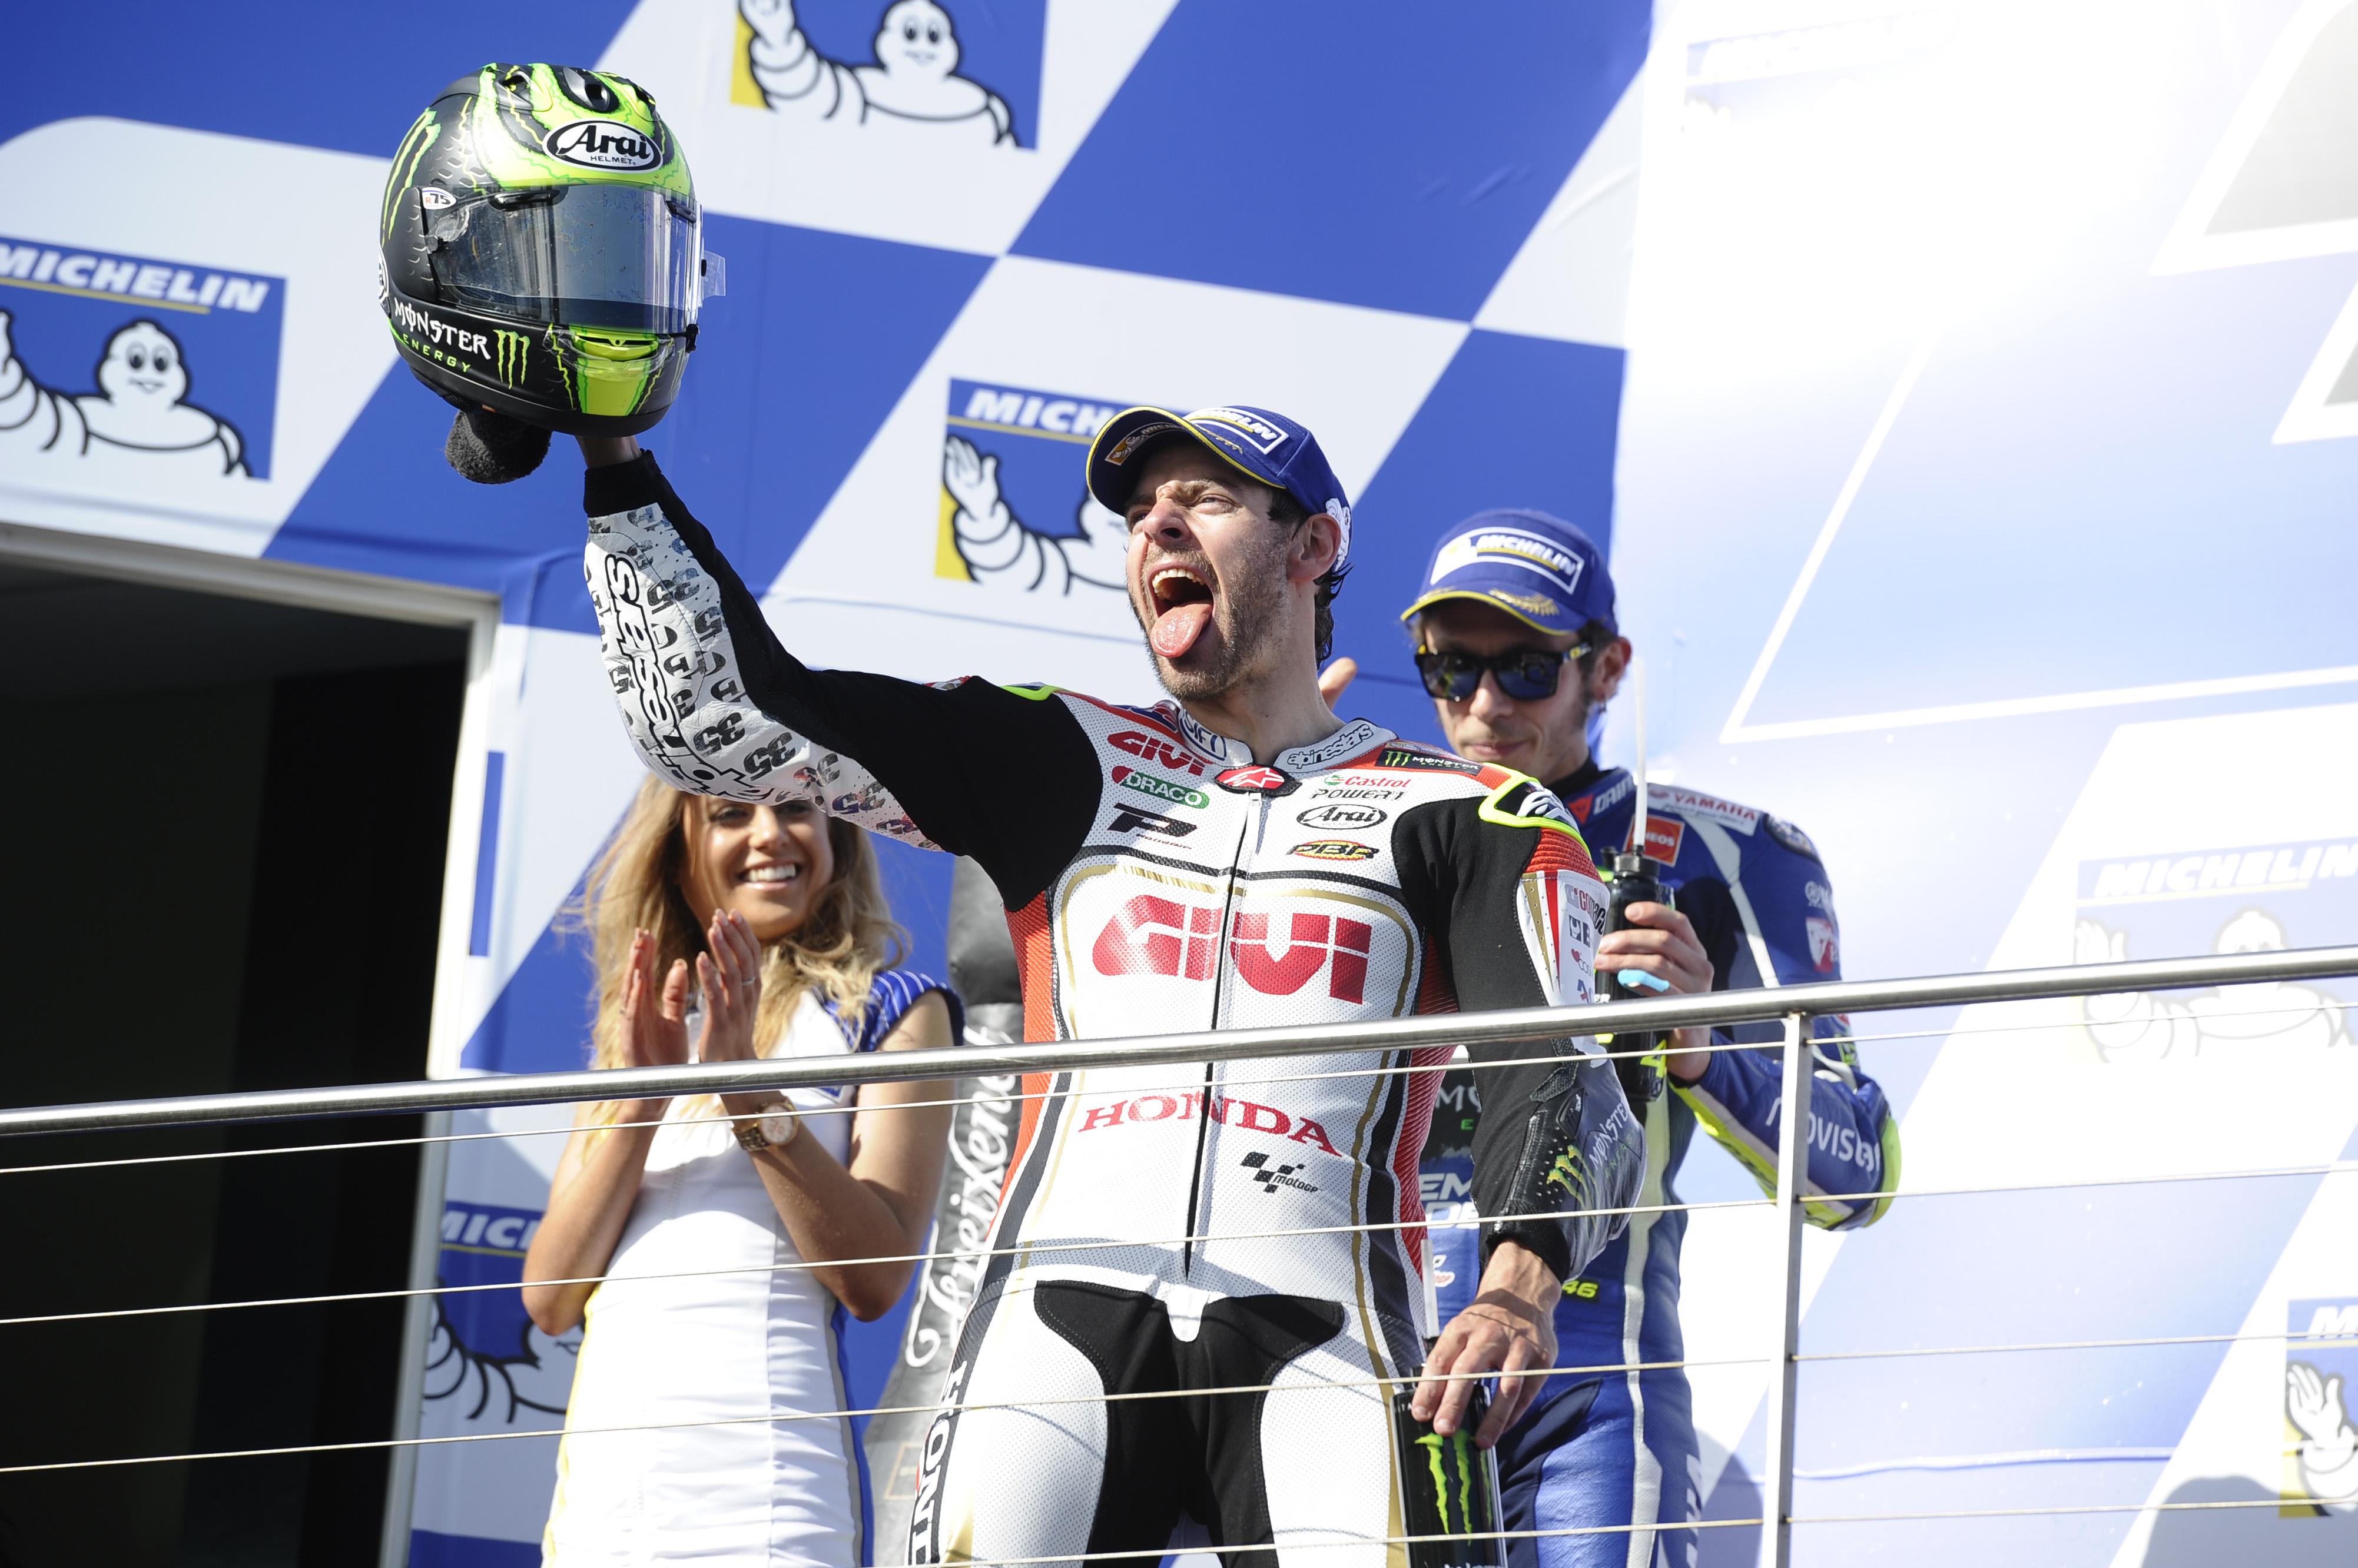 Cal Crutchlow wins Phillip Island MotoGP 2016